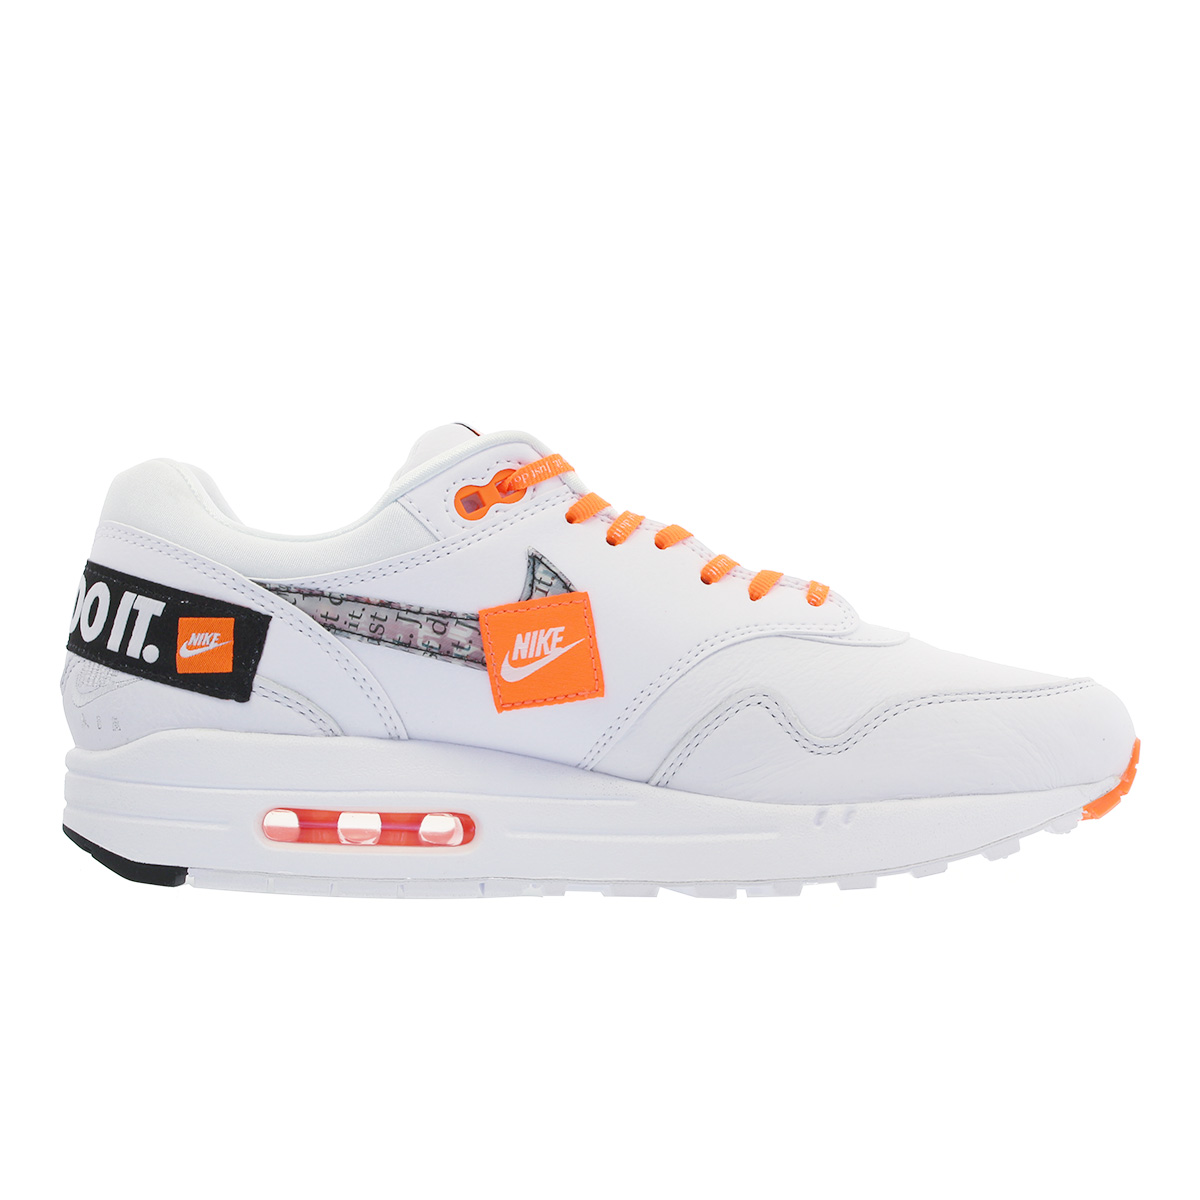 best sneakers 3b5c6 9e36f NIKE WMNS AIR MAX 1 LX Nike women Air Max 1 WHITE BLACK TOTAL ORANGE 917,691 -100